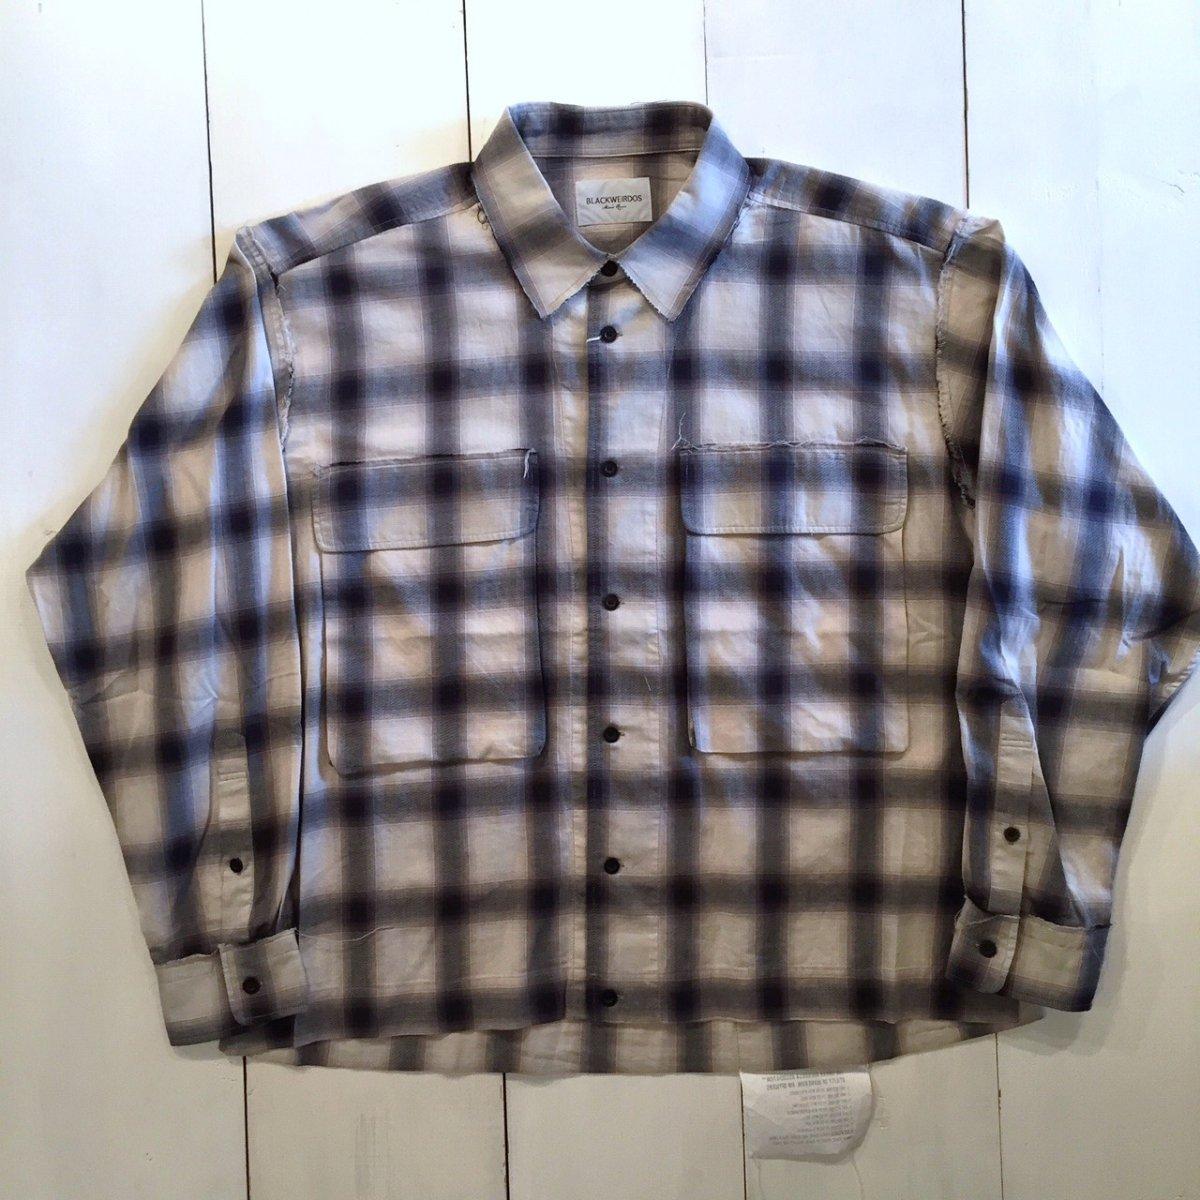 <img class='new_mark_img1' src='https://img.shop-pro.jp/img/new/icons3.gif' style='border:none;display:inline;margin:0px;padding:0px;width:auto;' />Black weirdos  ブラック ウィドー / シャツBig Pocket Shirt